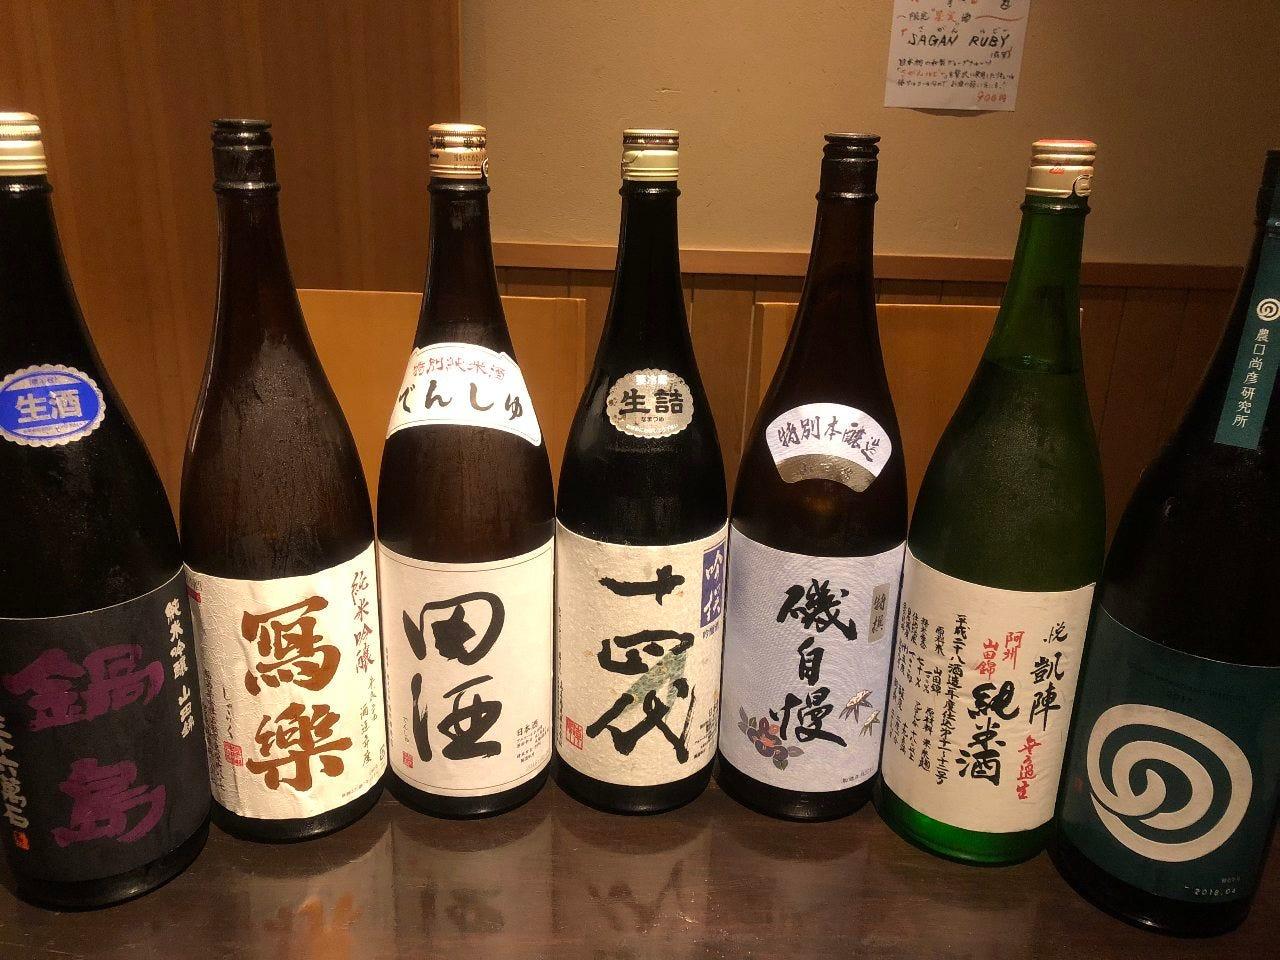 利酒師が選ぶ【特選銘酒】数十種!